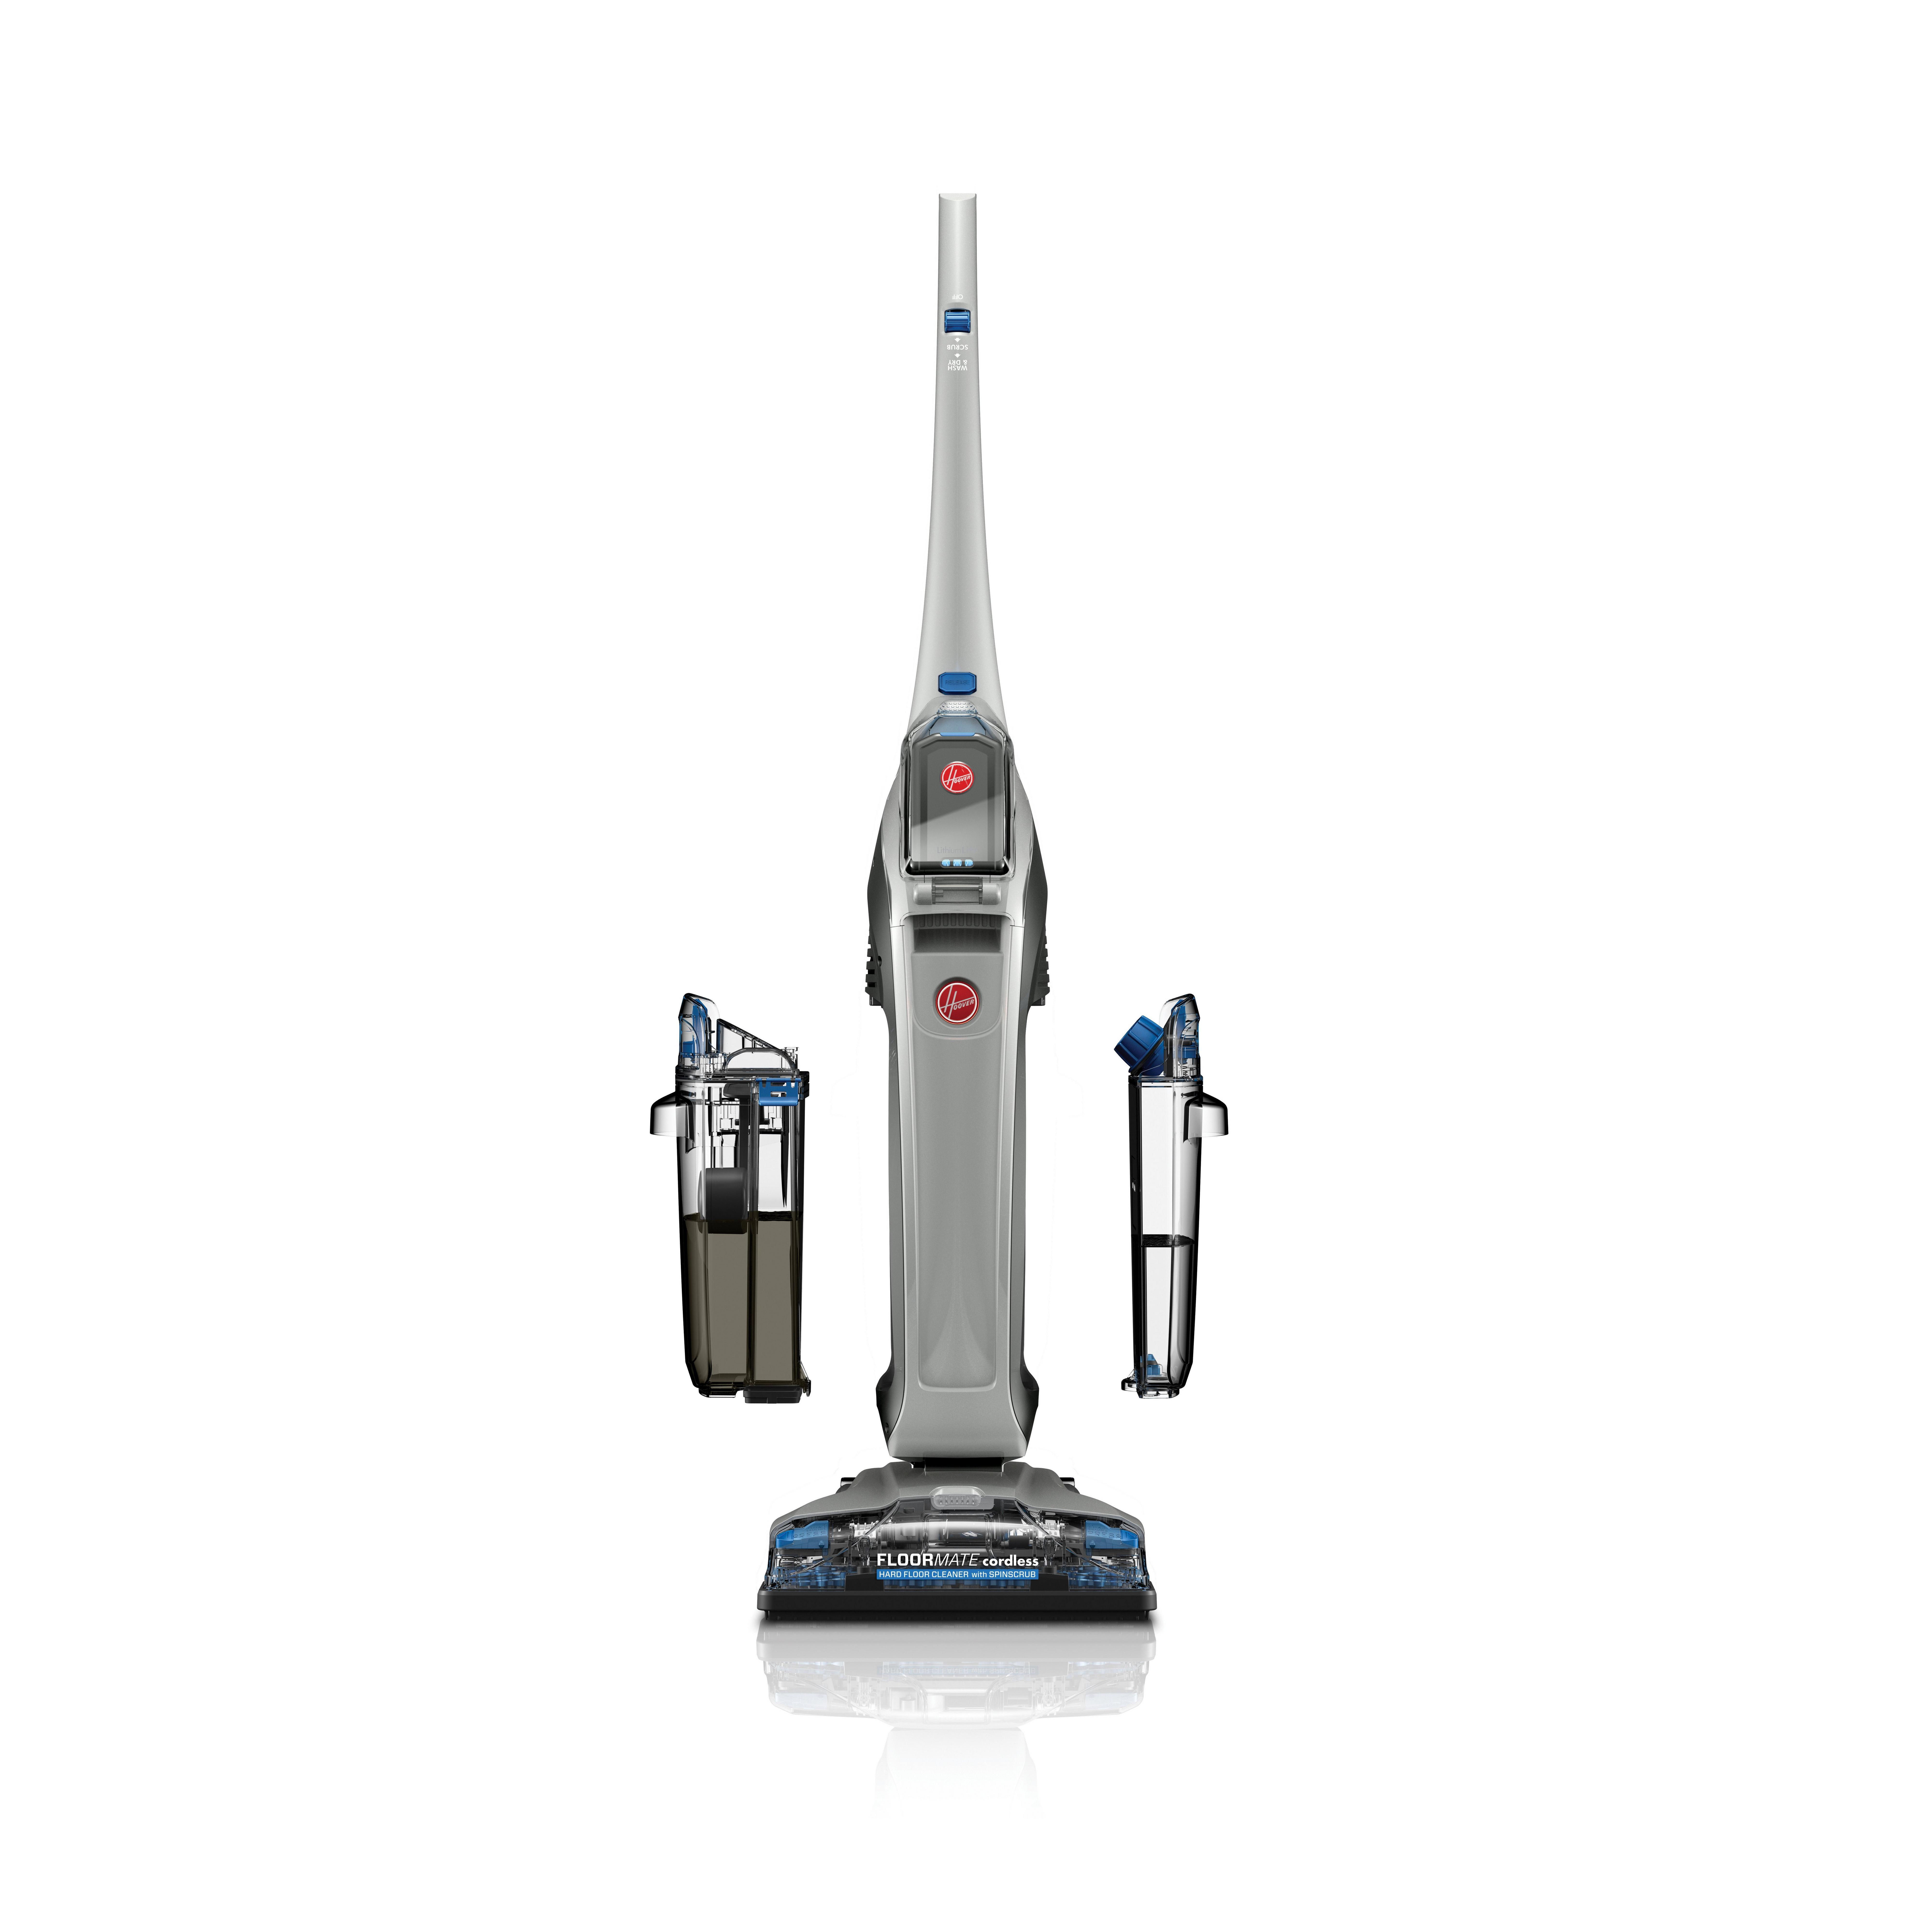 Hoover cordless floormate hard floor cleaner bh55100pc 73502042397 hoover cordless floormate hard floor cleaner bh55100pc tyukafo